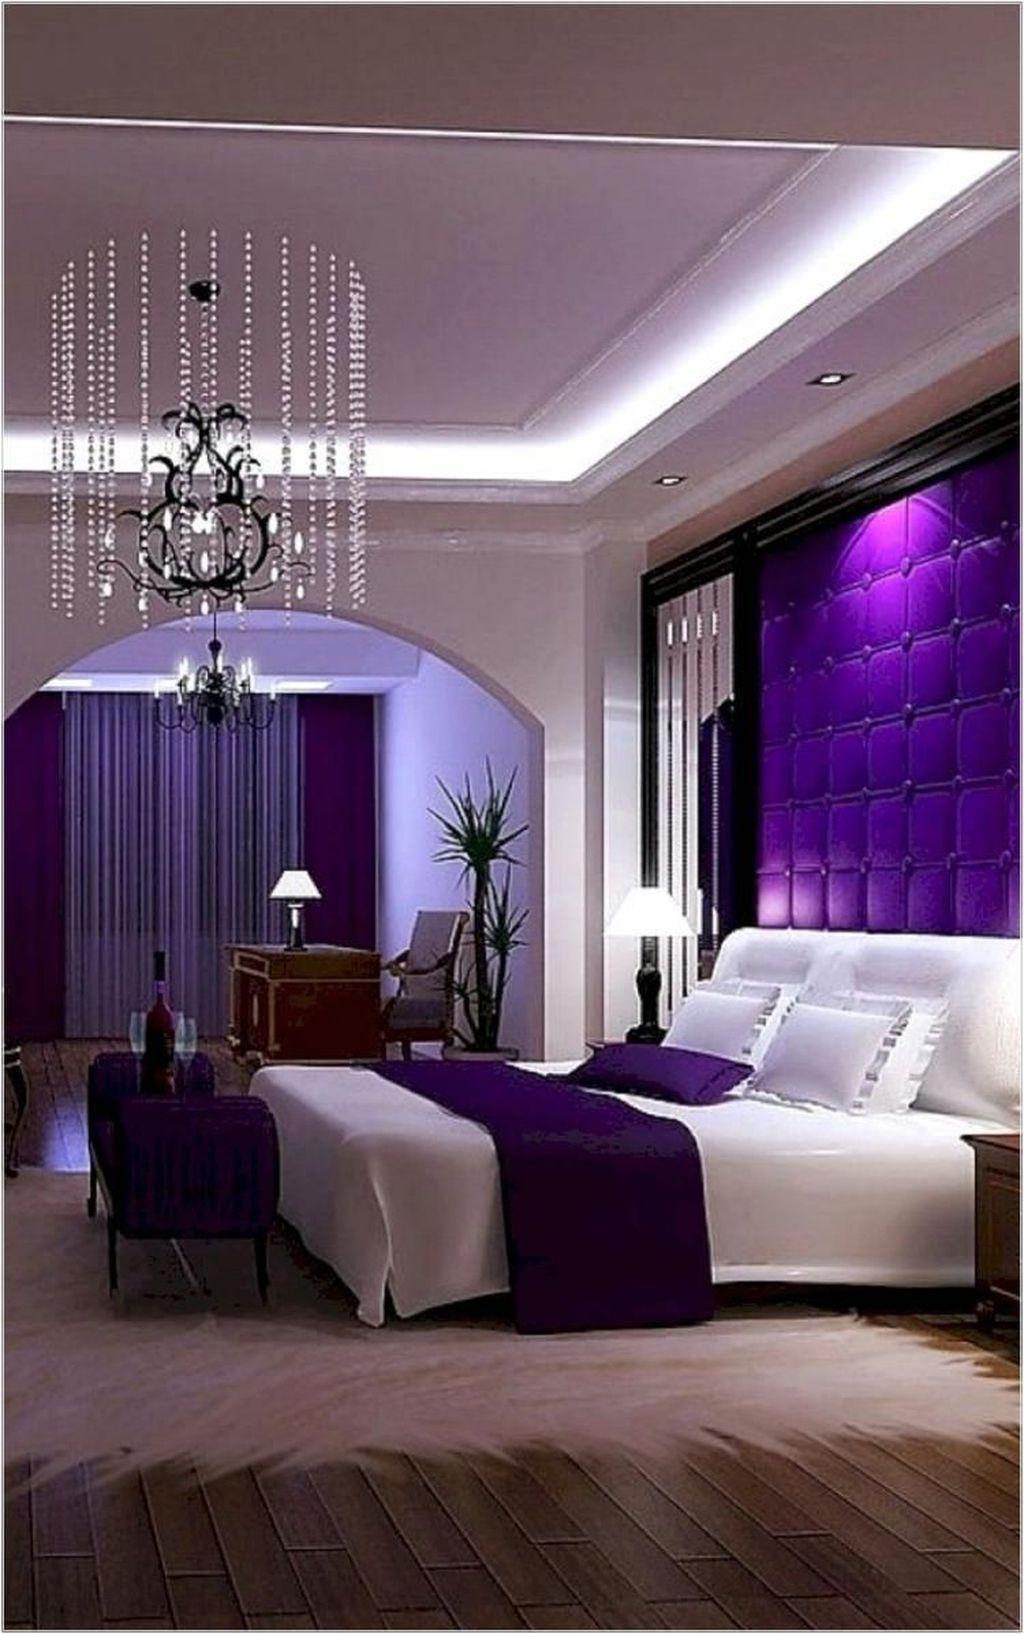 50 Inspiring Romantic Master Bedroom Ideas For Burning Love Trendehouse Purple Master Bedroom Purple Bedroom Design Purple Bedrooms